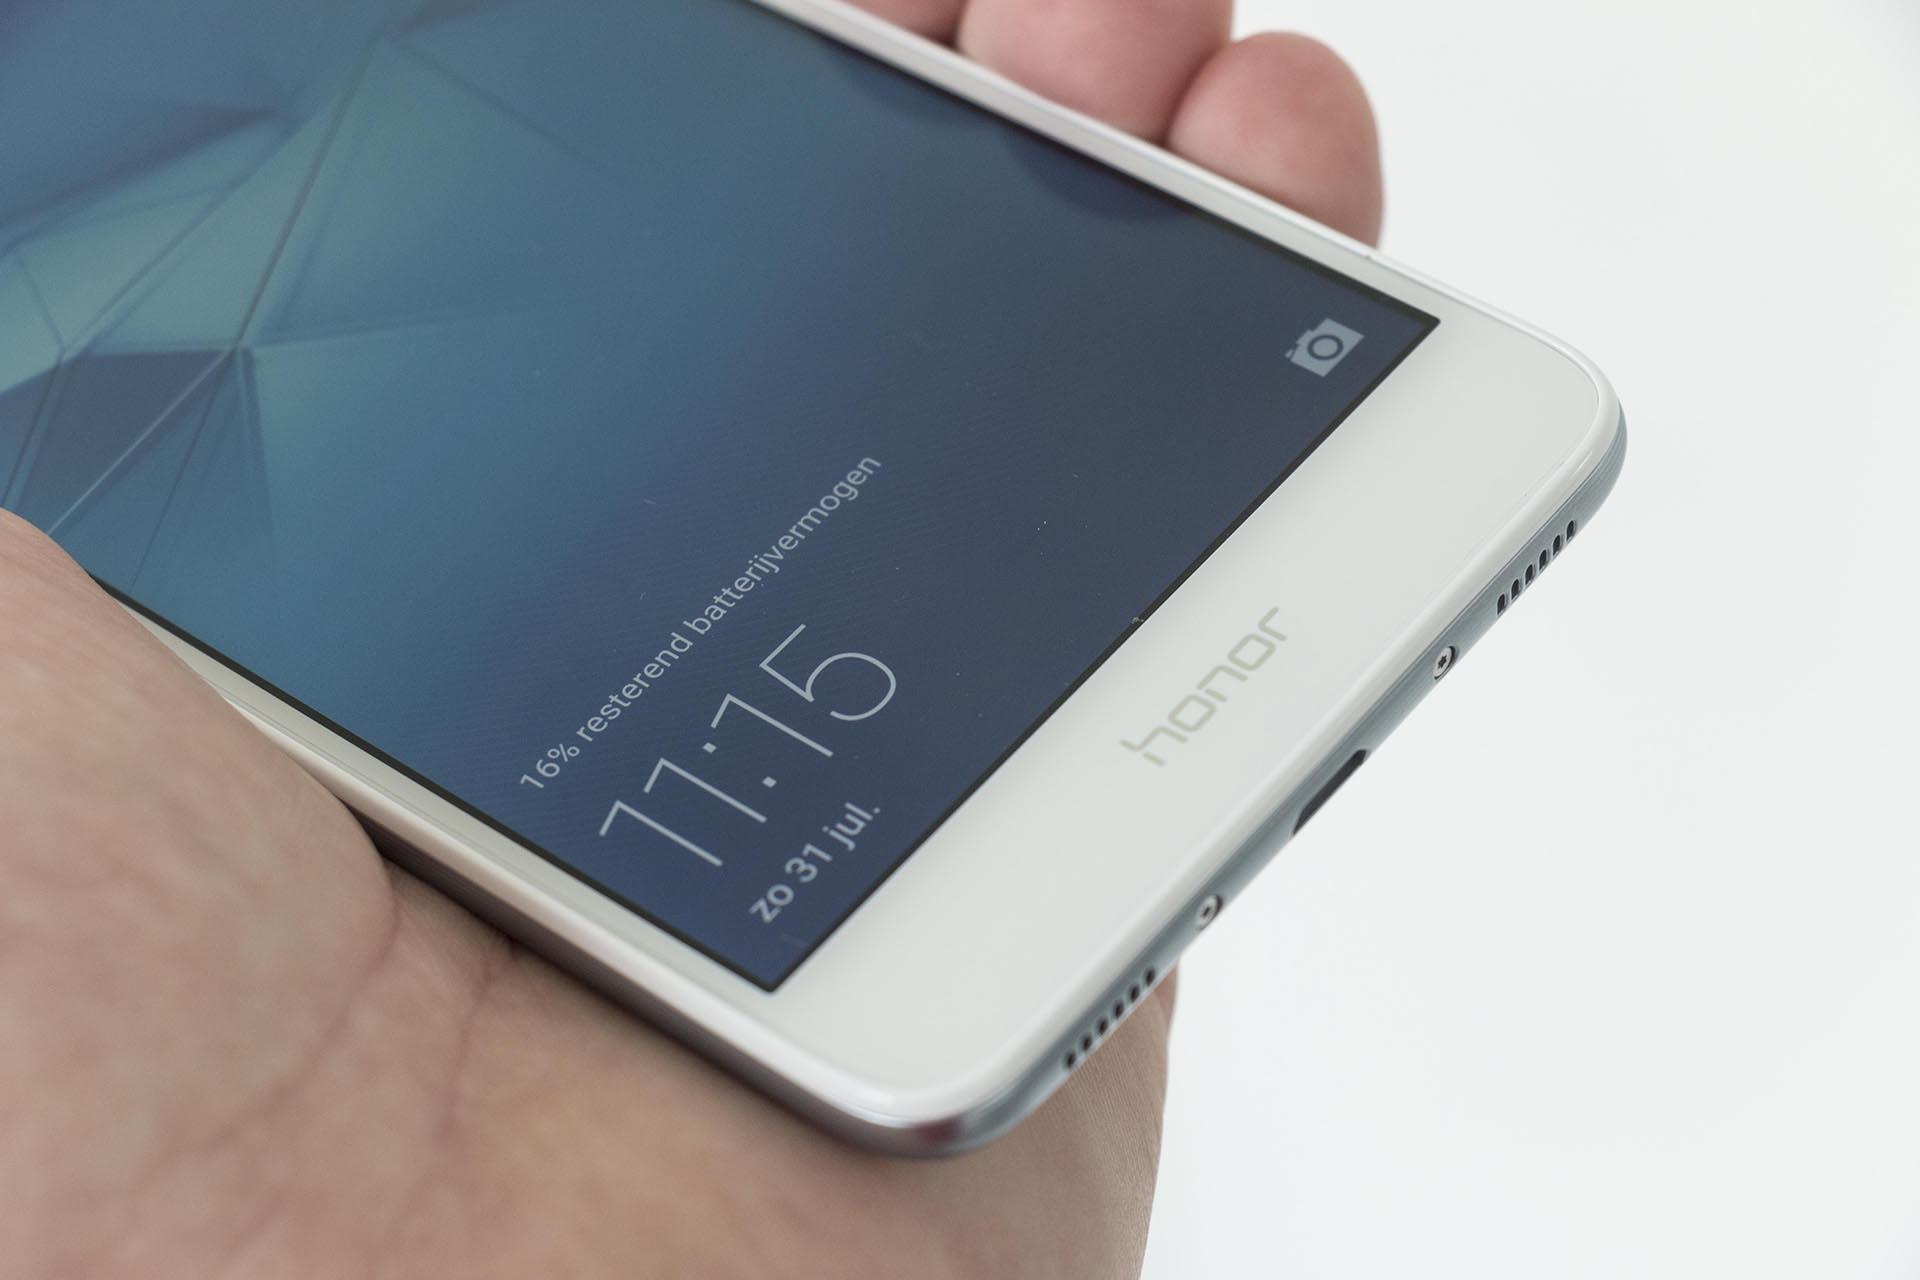 Huawei Honor 5c _MG_0022